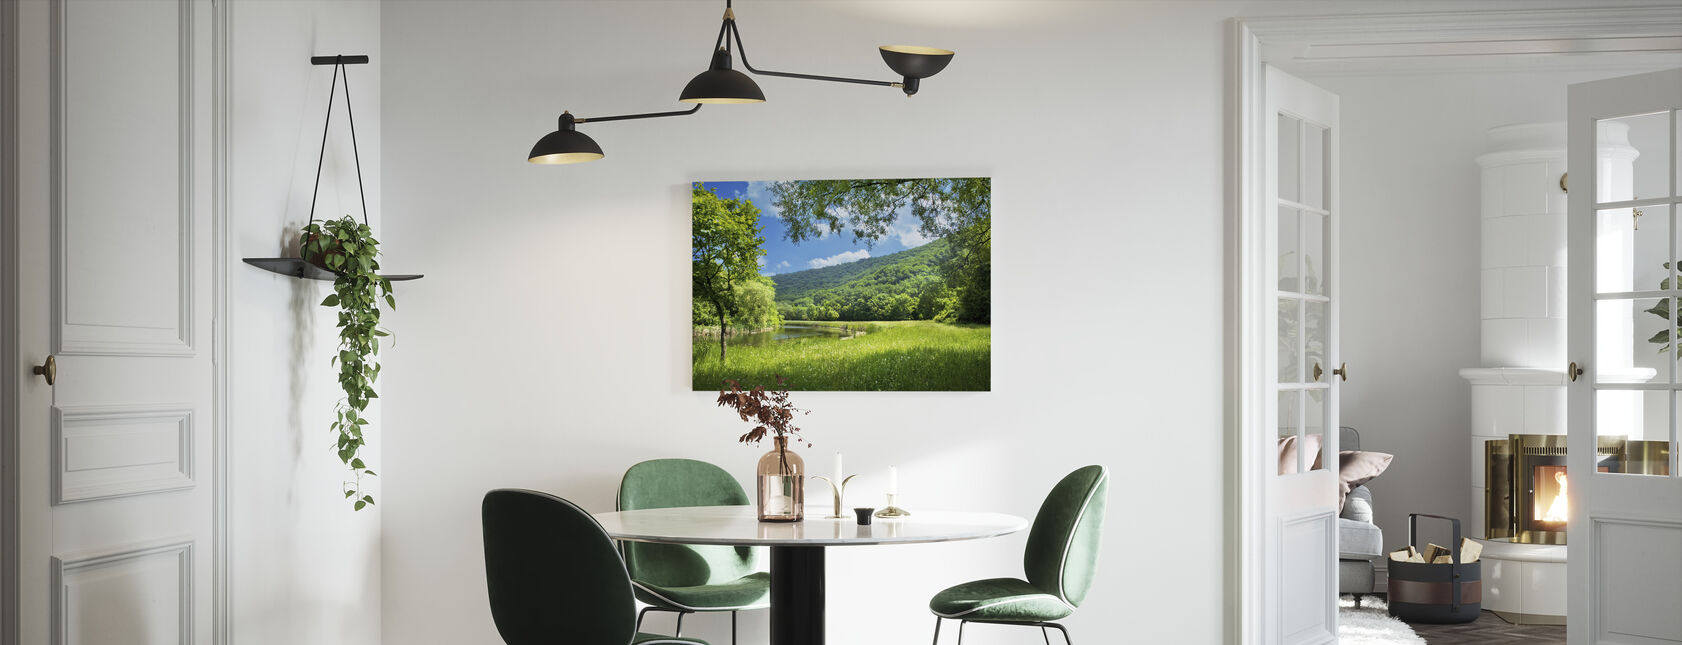 Summer Landscape with River - Canvas print - Kitchen